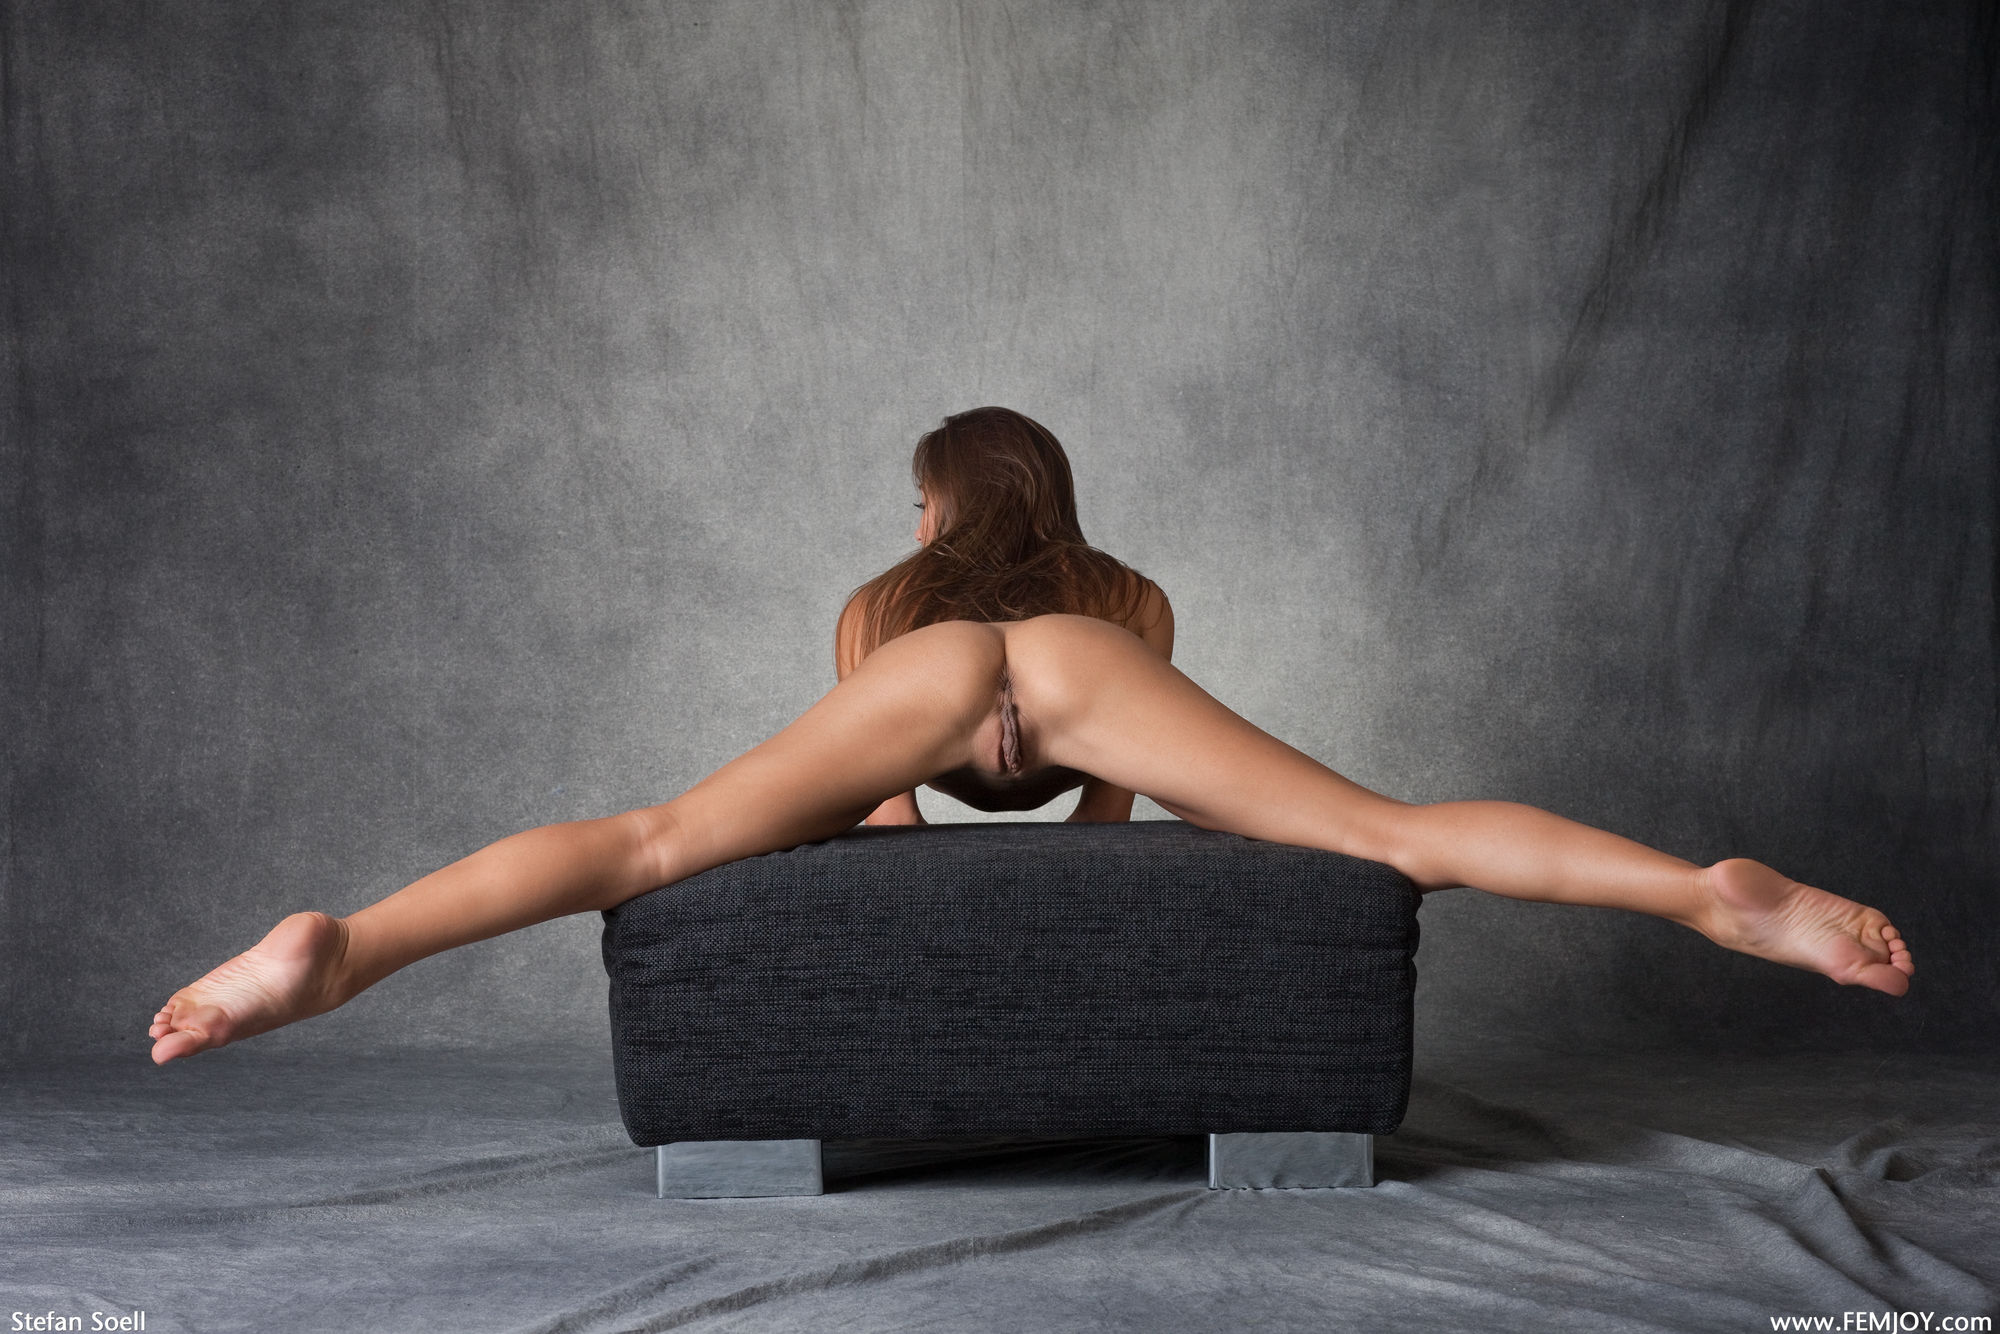 feet-fetish-nude-girls-foot-mix-vol5-21